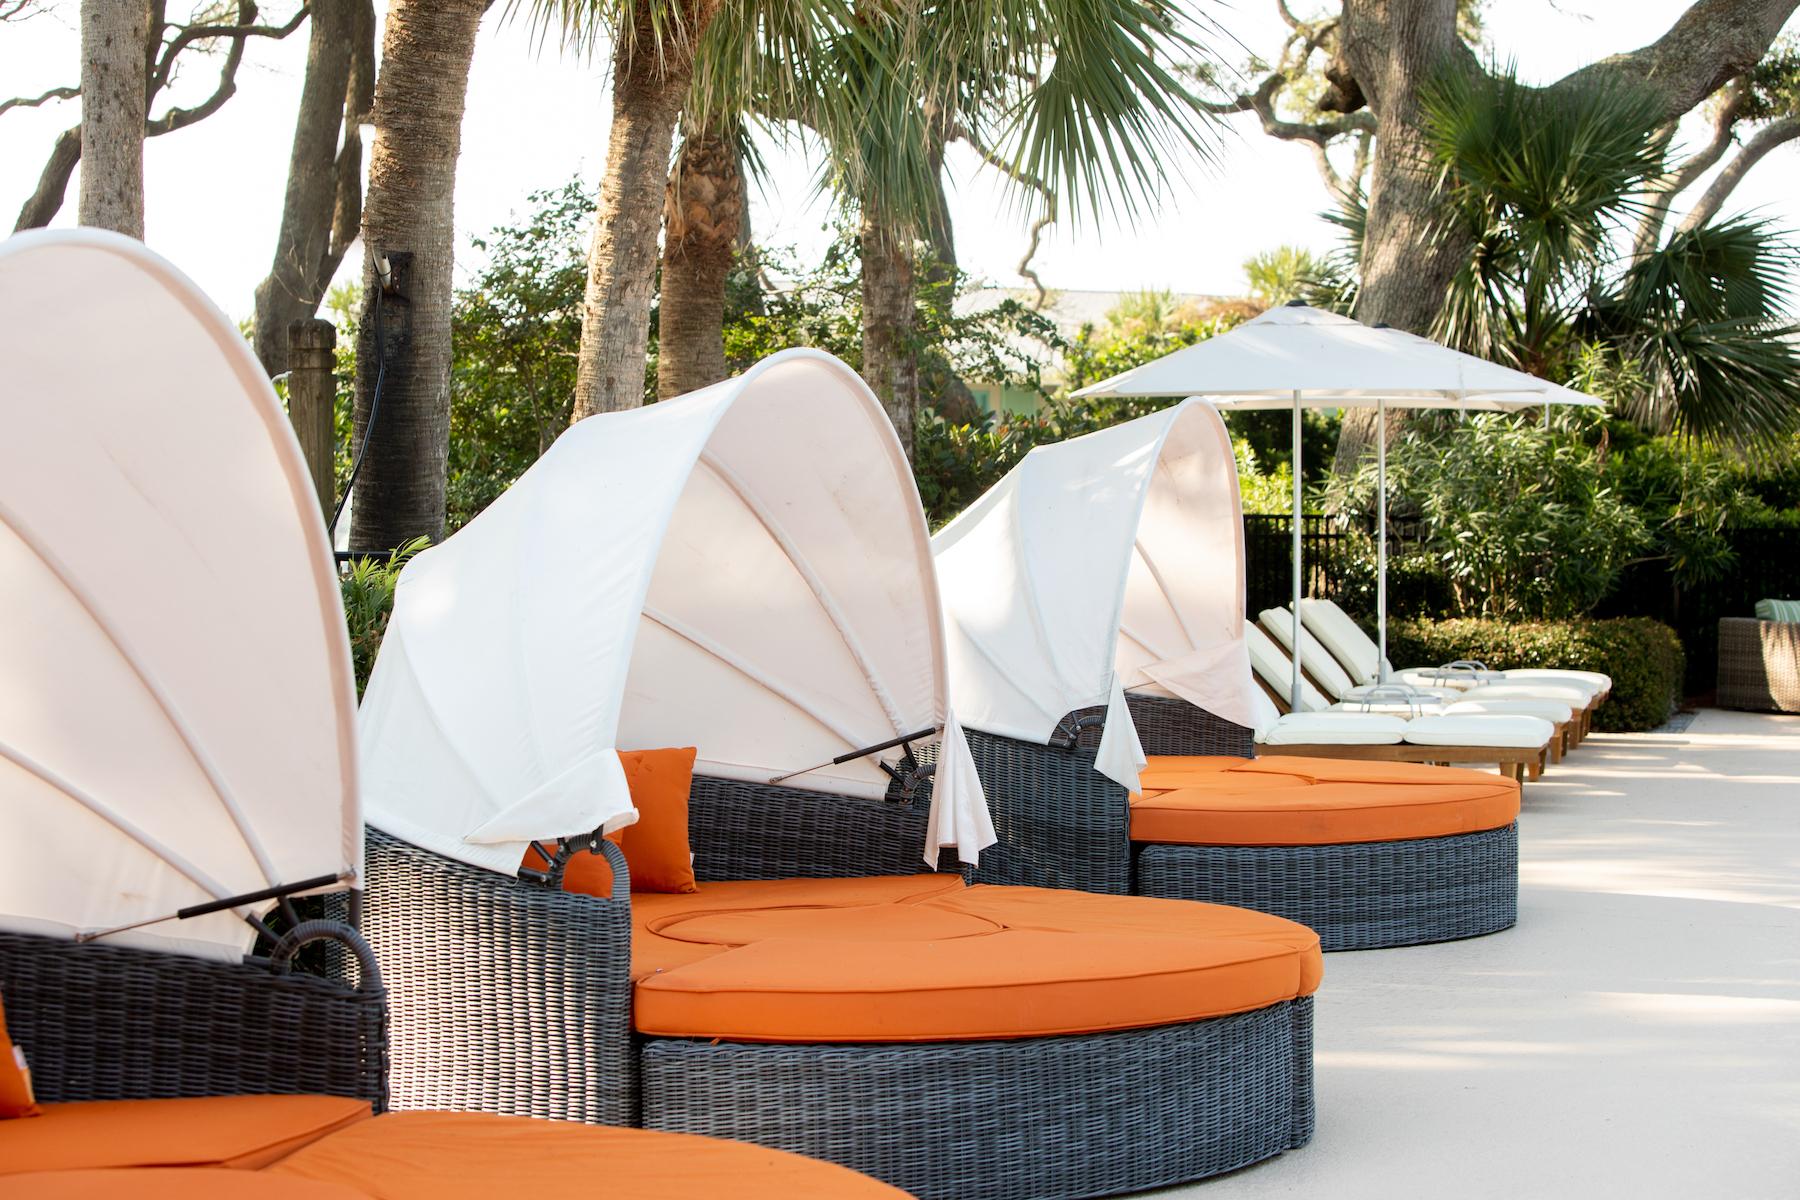 Beachview Club Pool Cabana